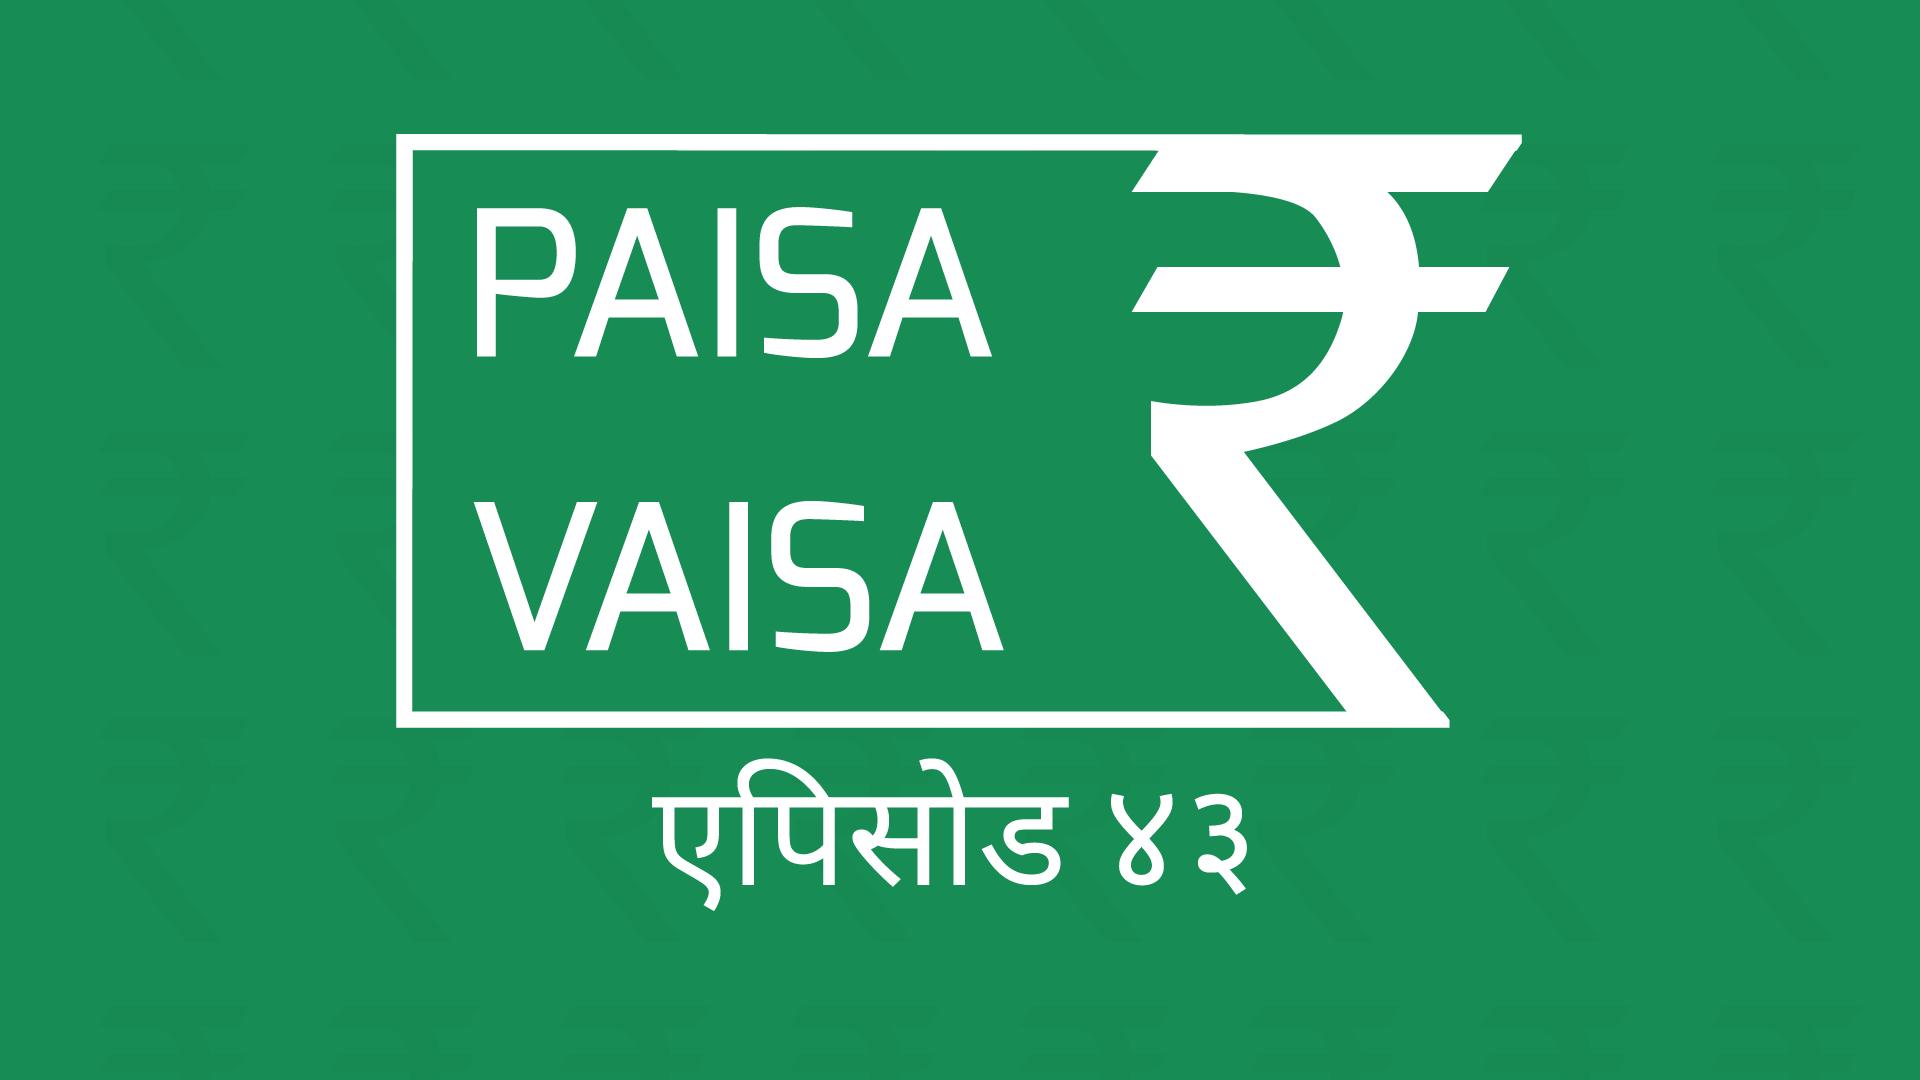 PaisaVaisaHindiEpisode43.png